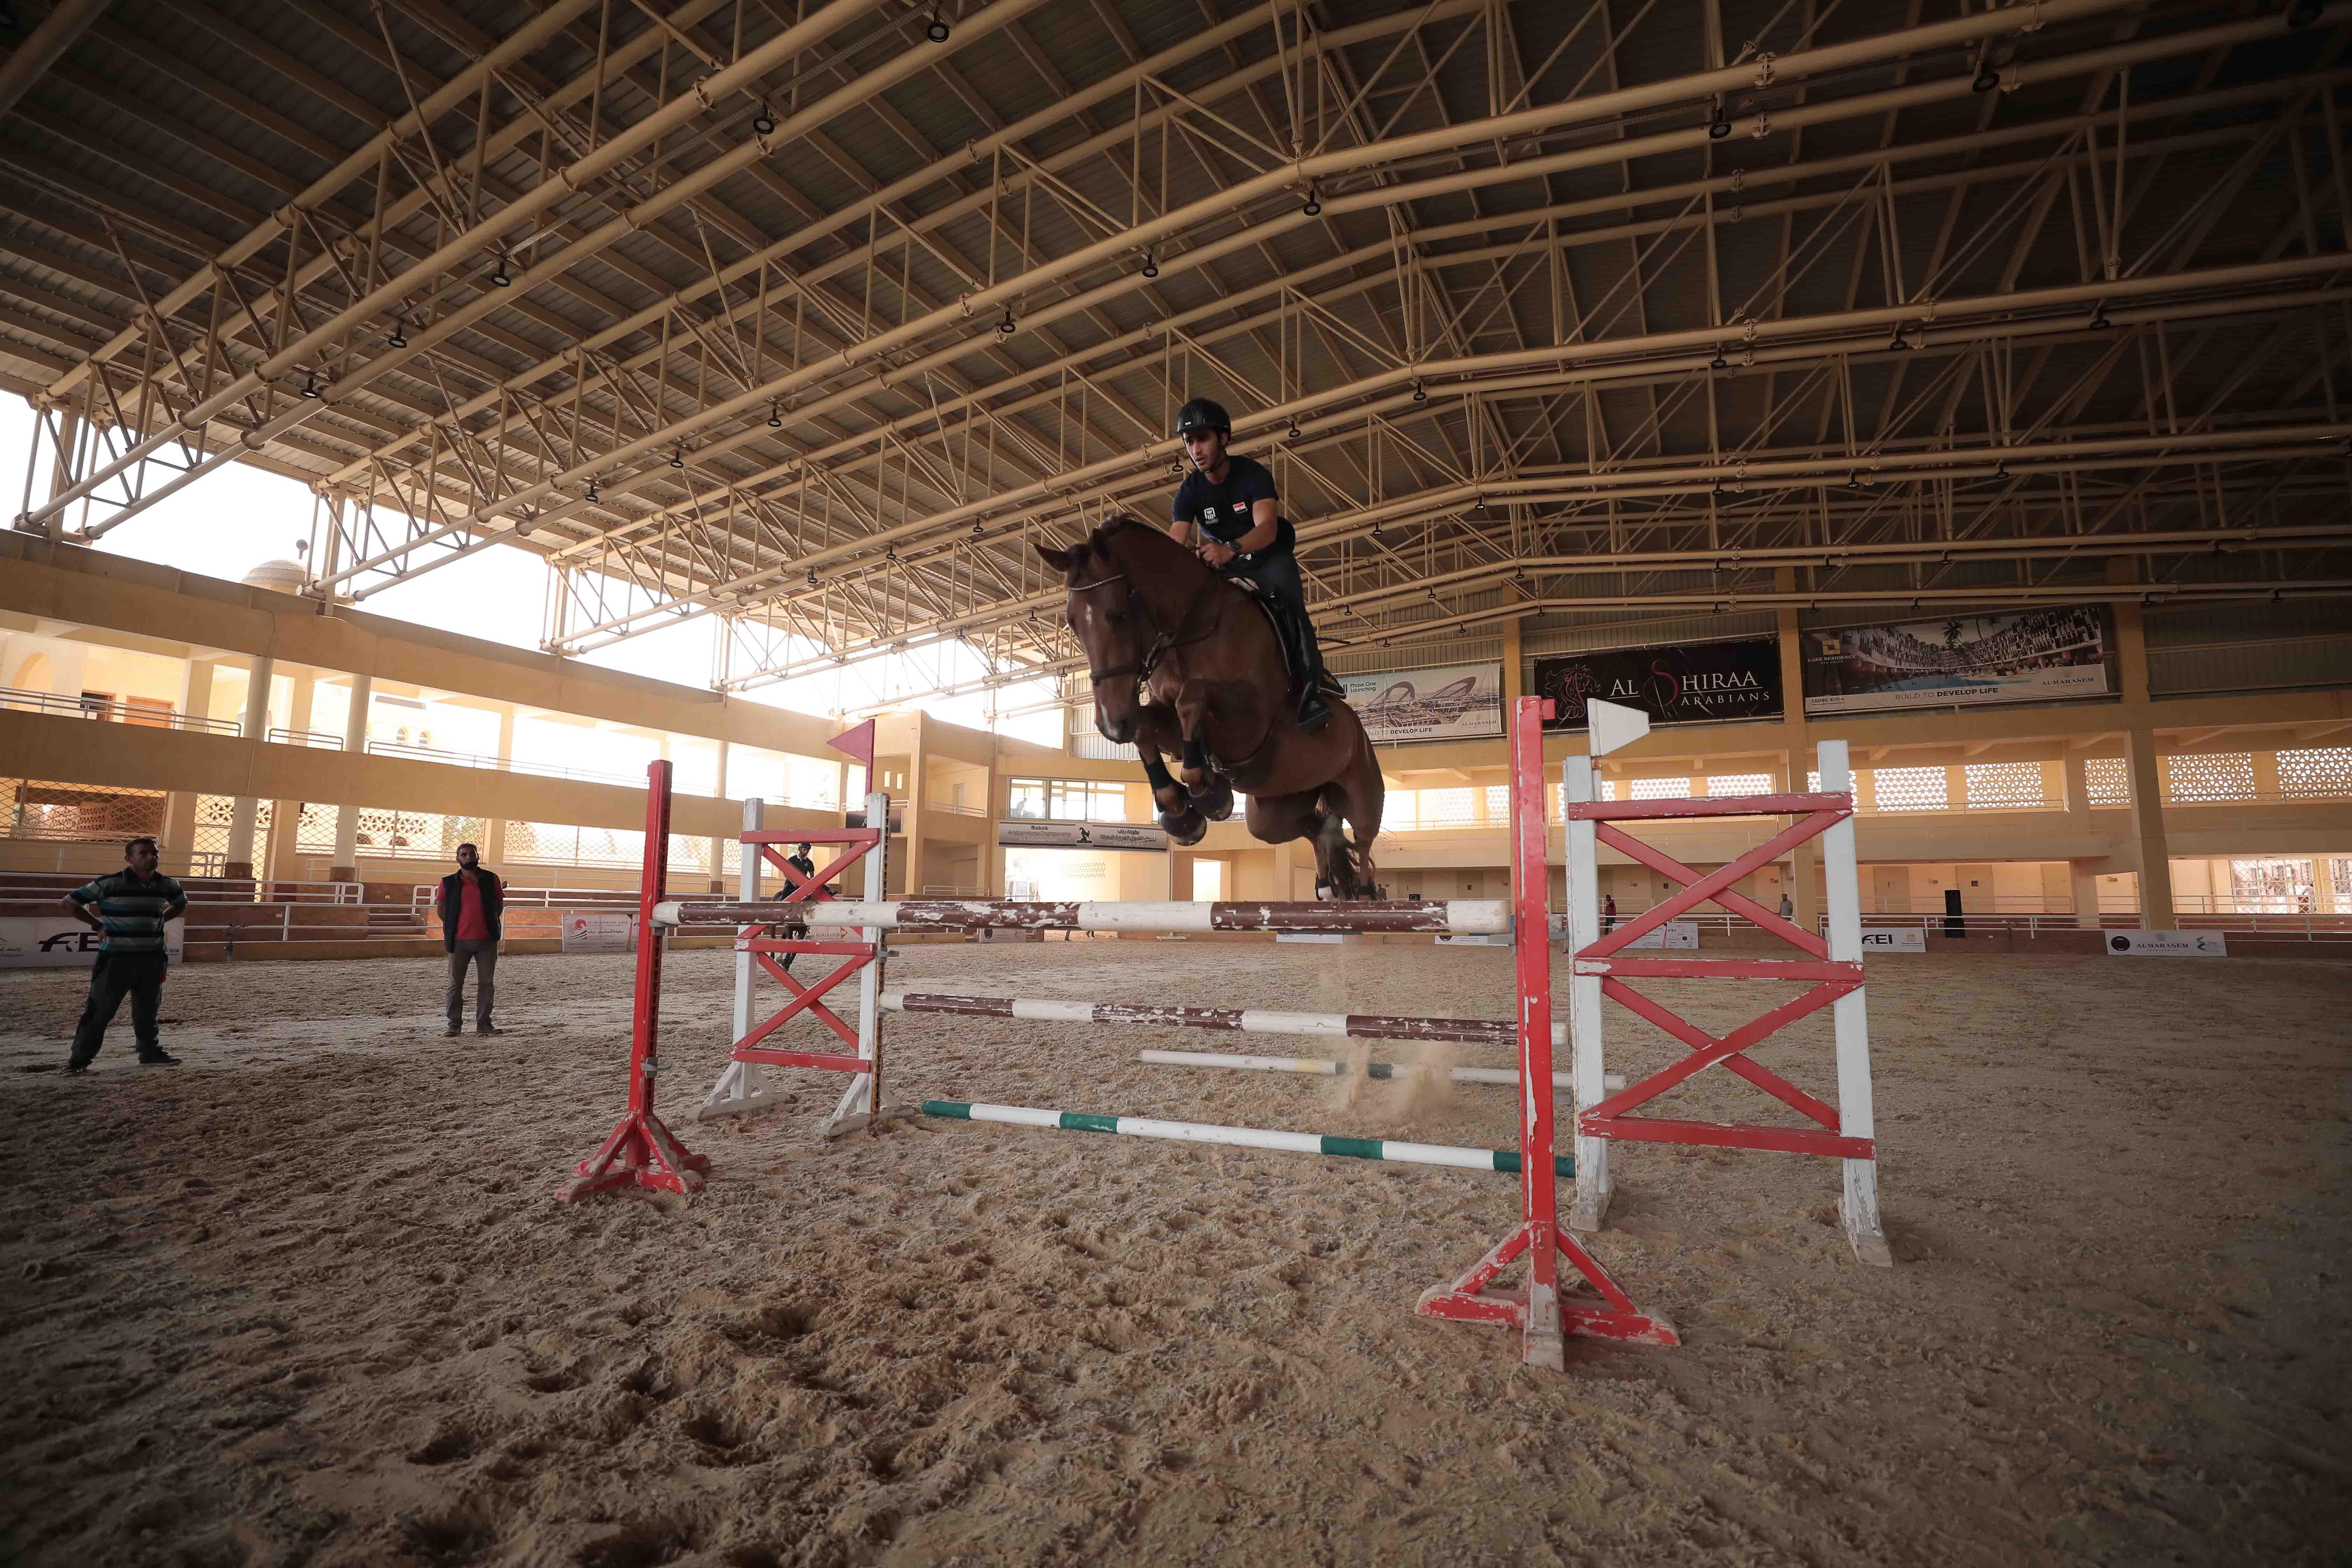 egyptian equestrian